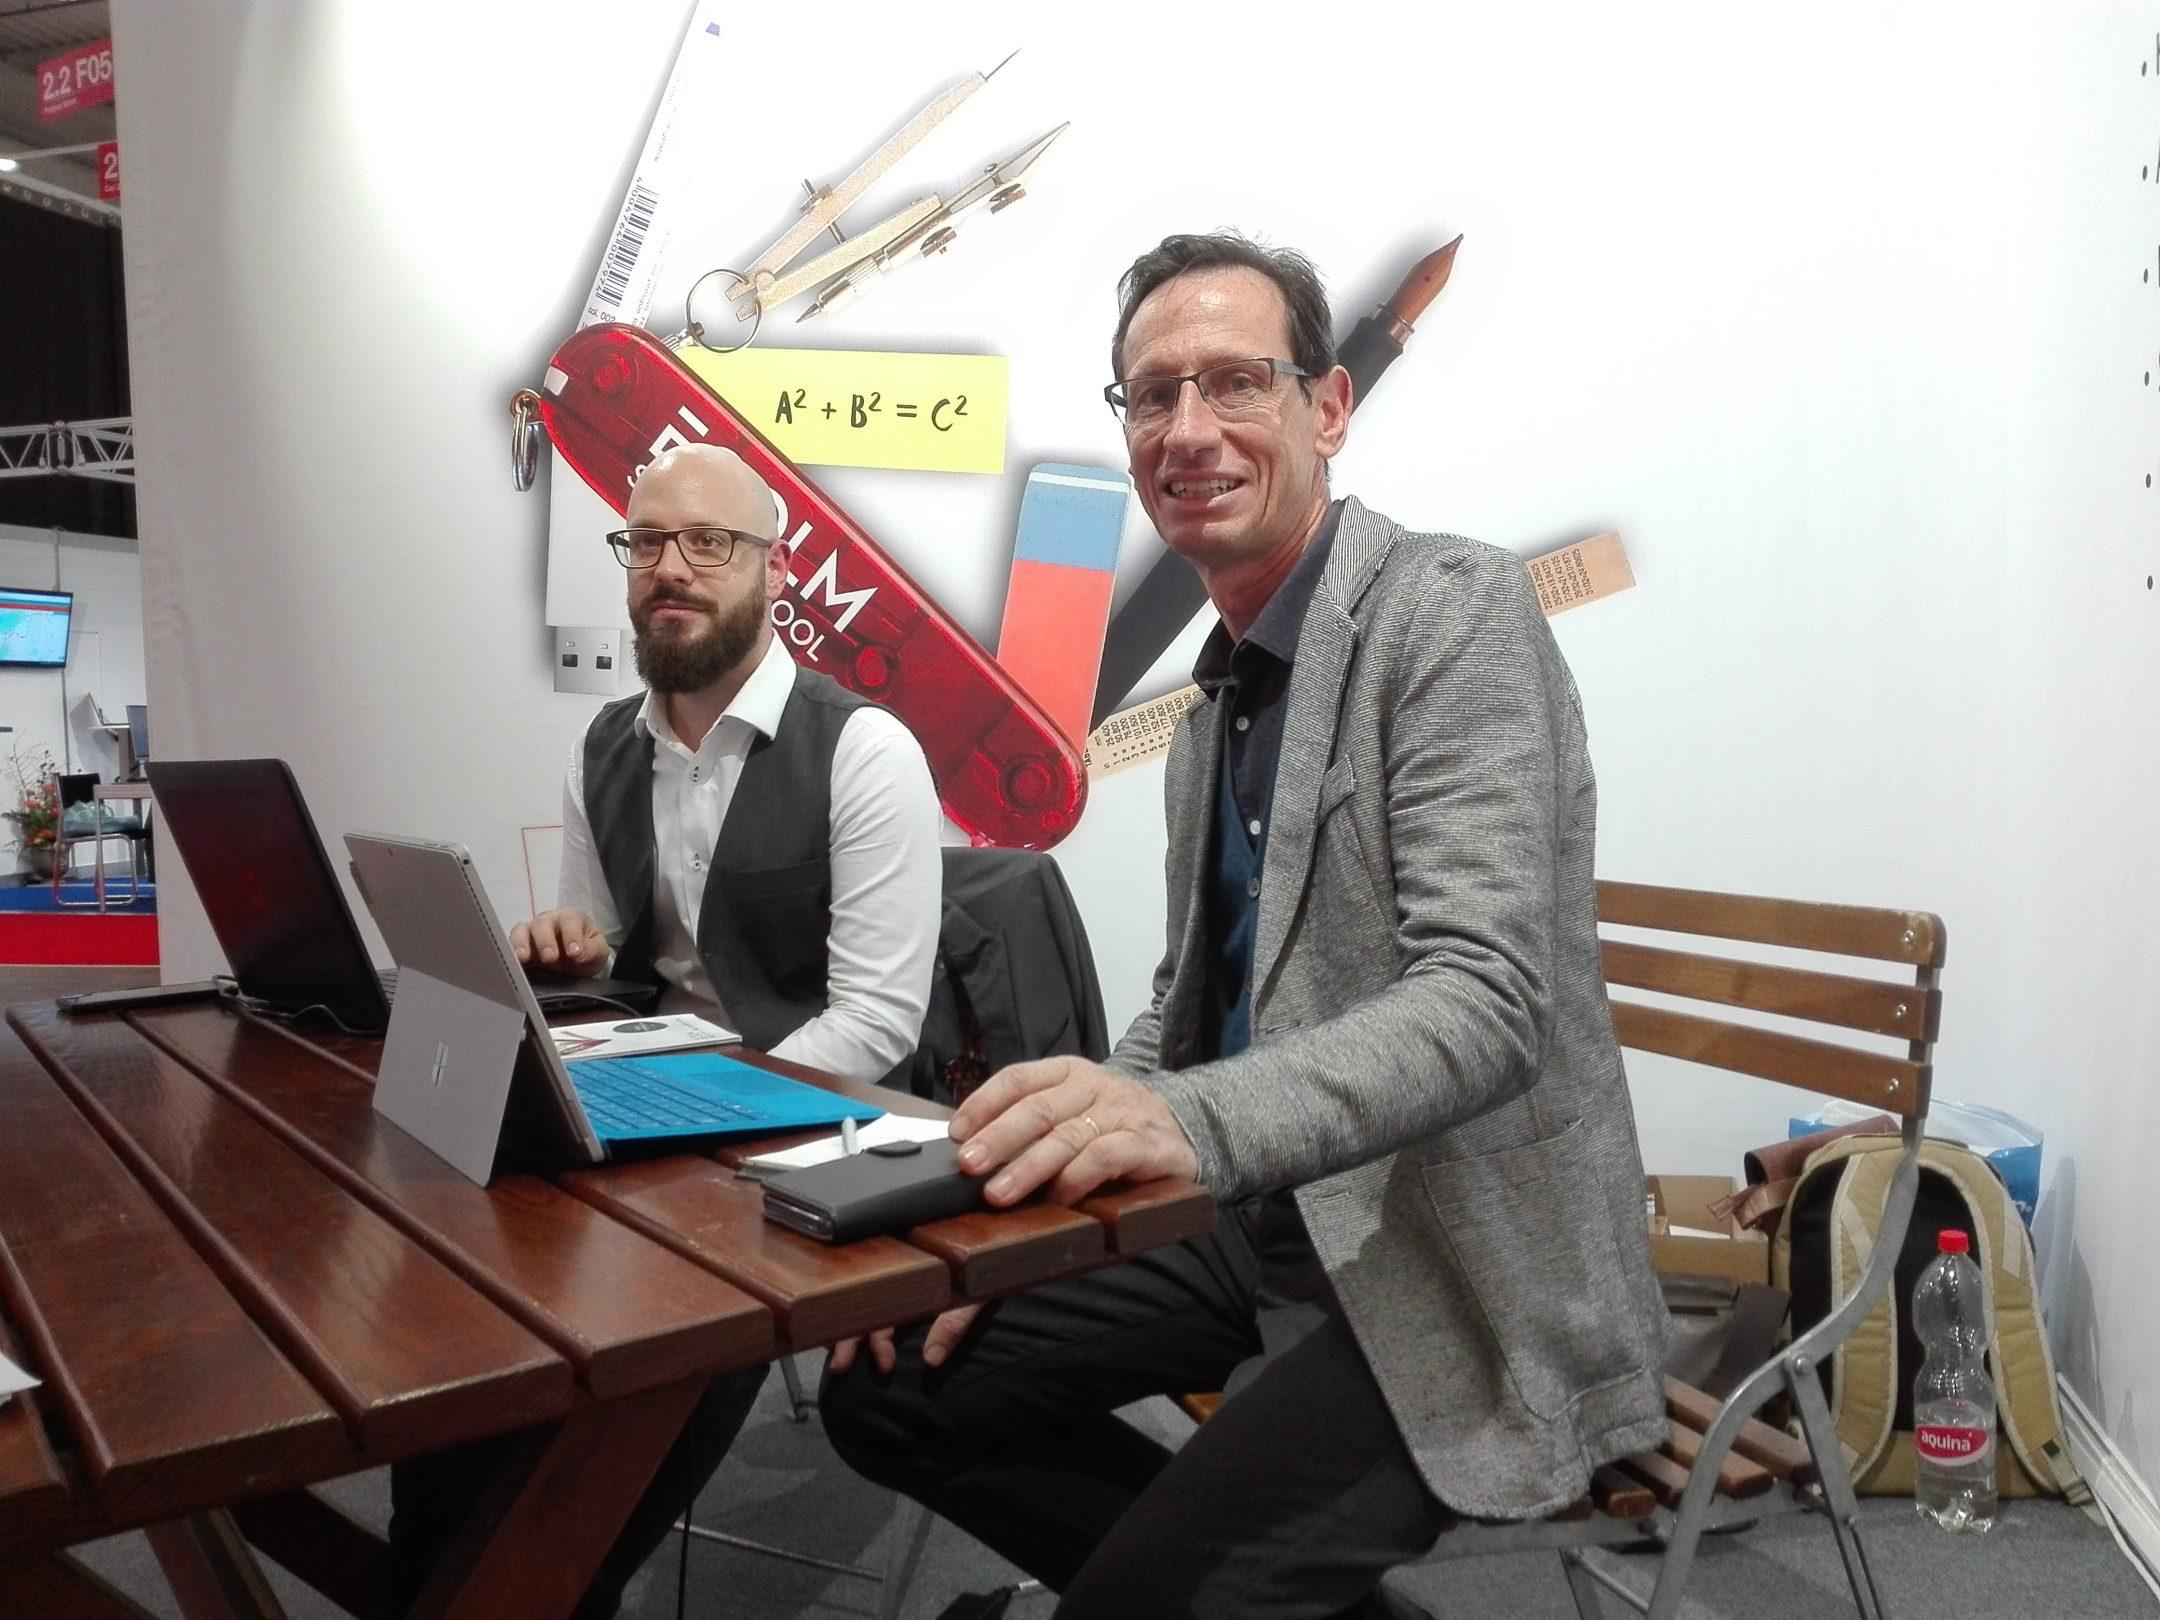 Ovidio Raimondi, Geschäftsführer, Prodaxo GmbH